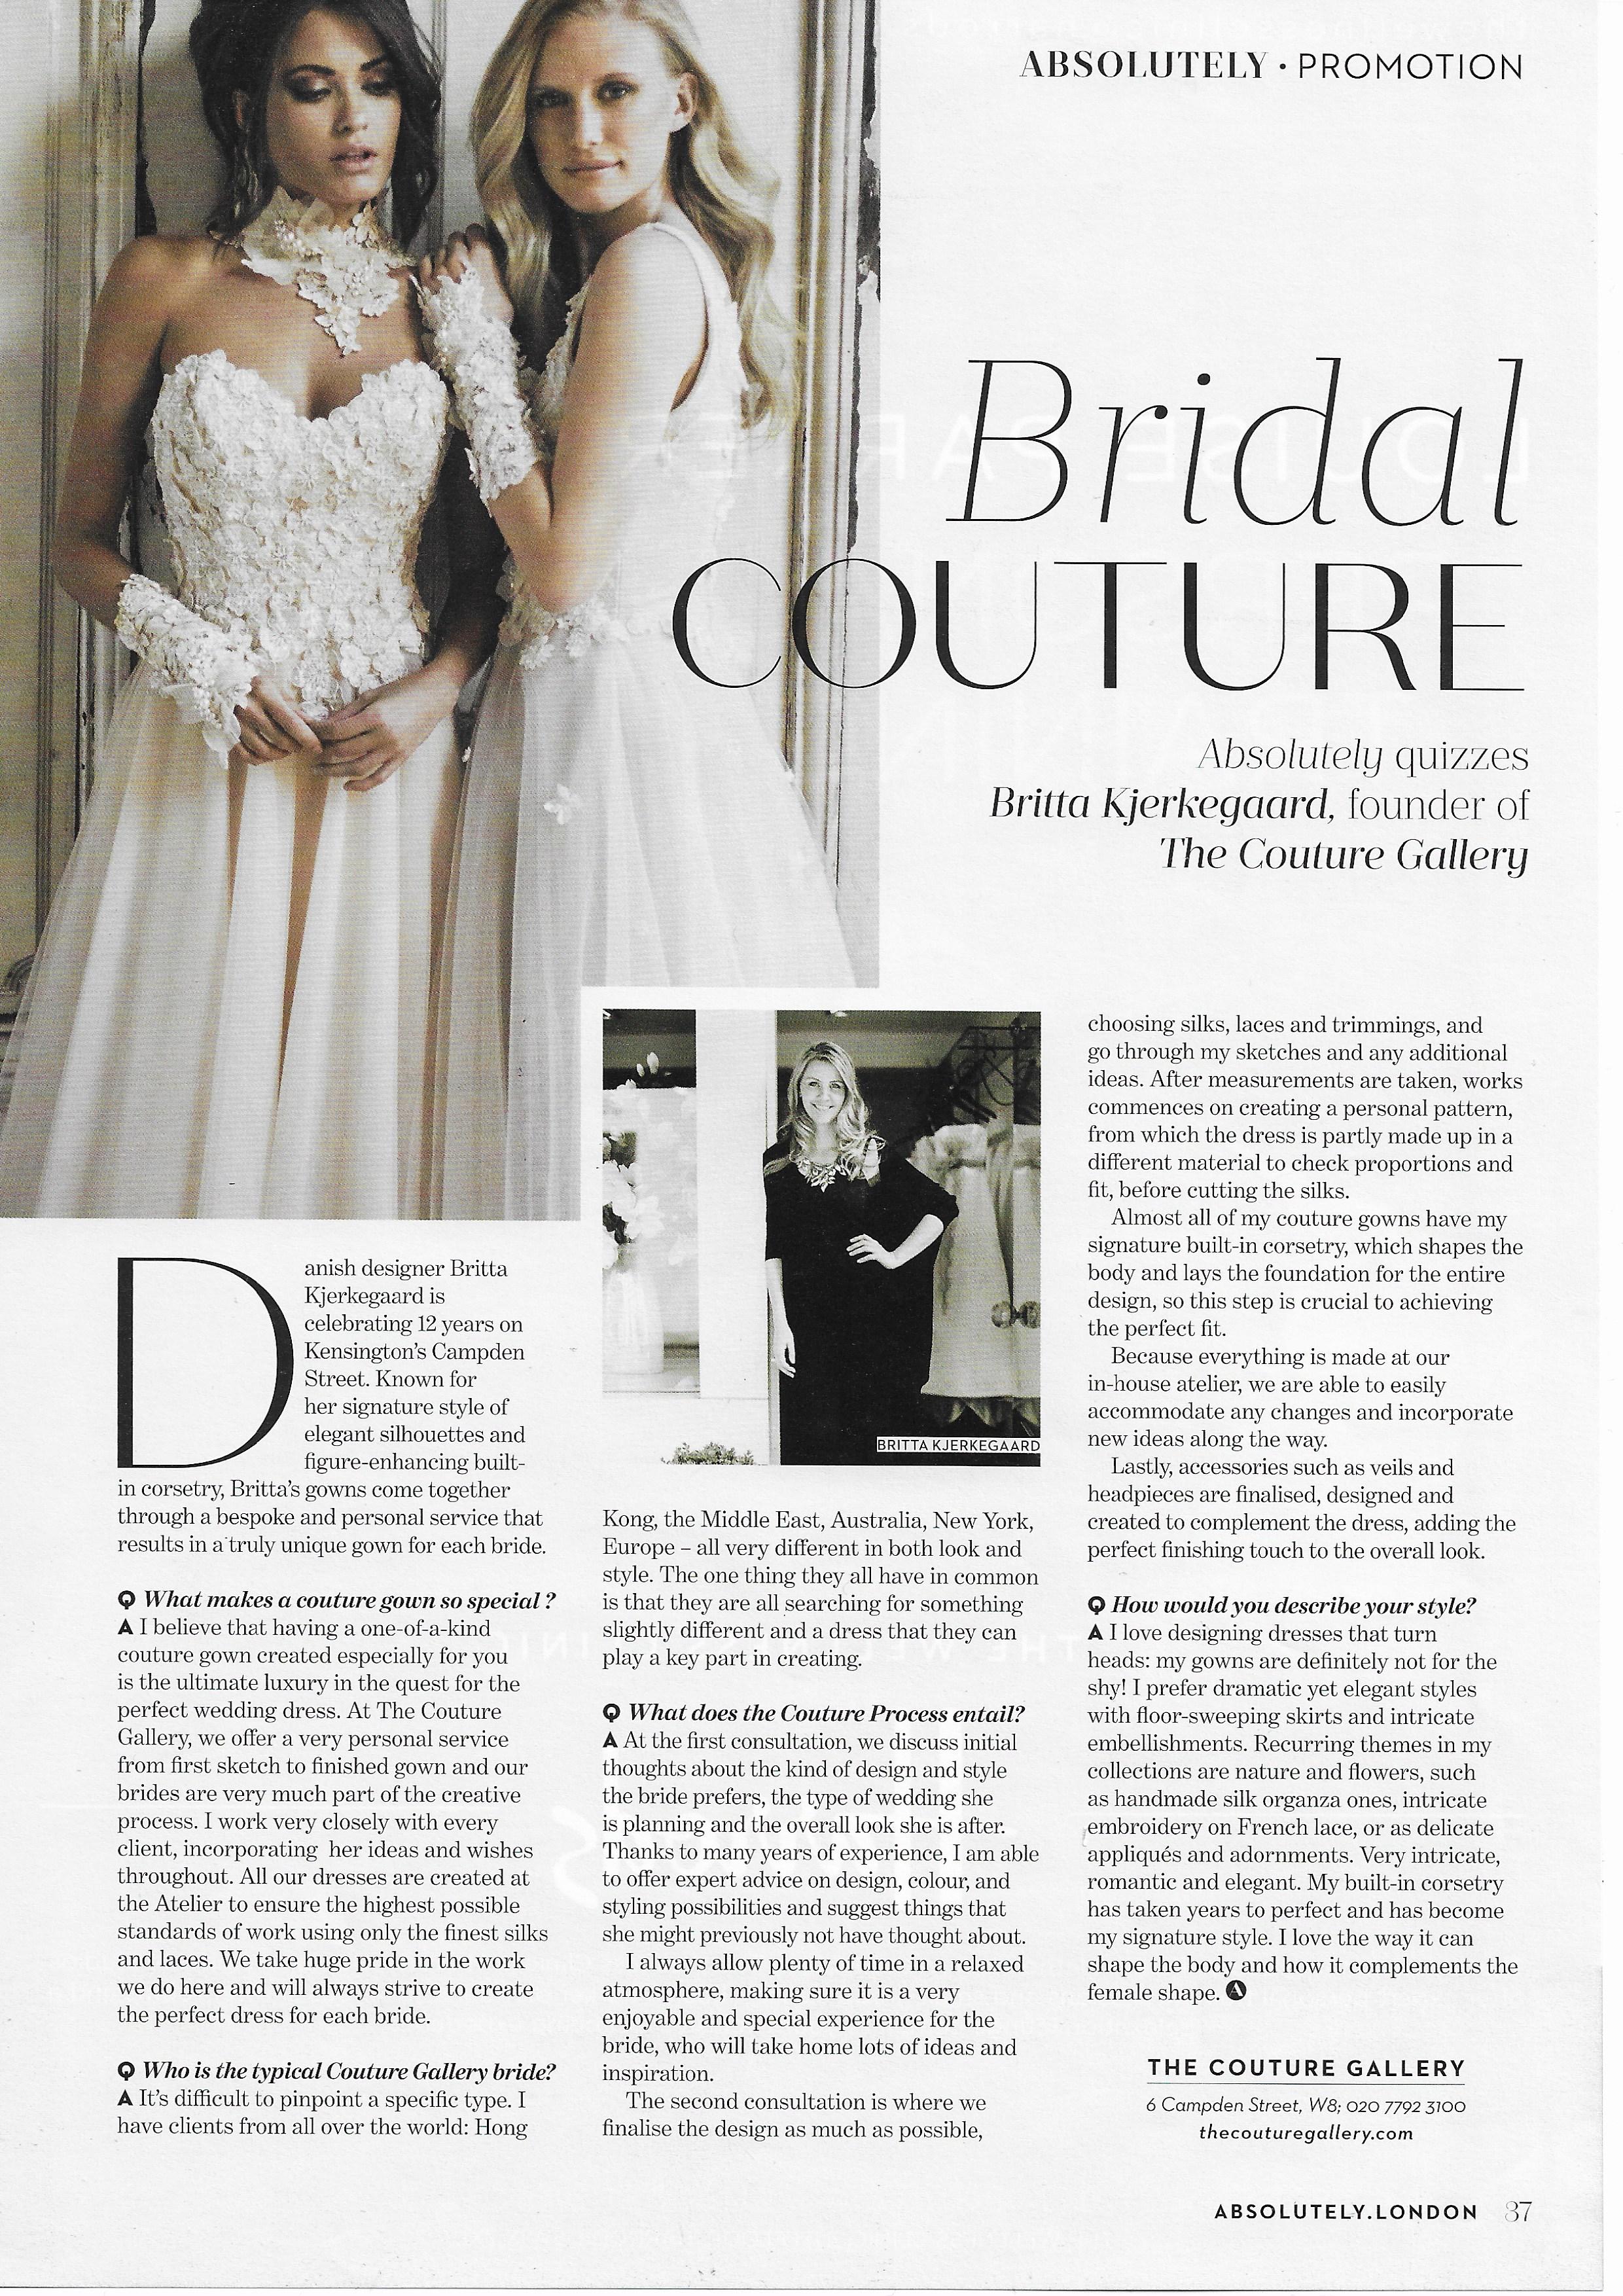 Absolutely Magazine Jan 2019 - Interview with Britta Kjerkegaard